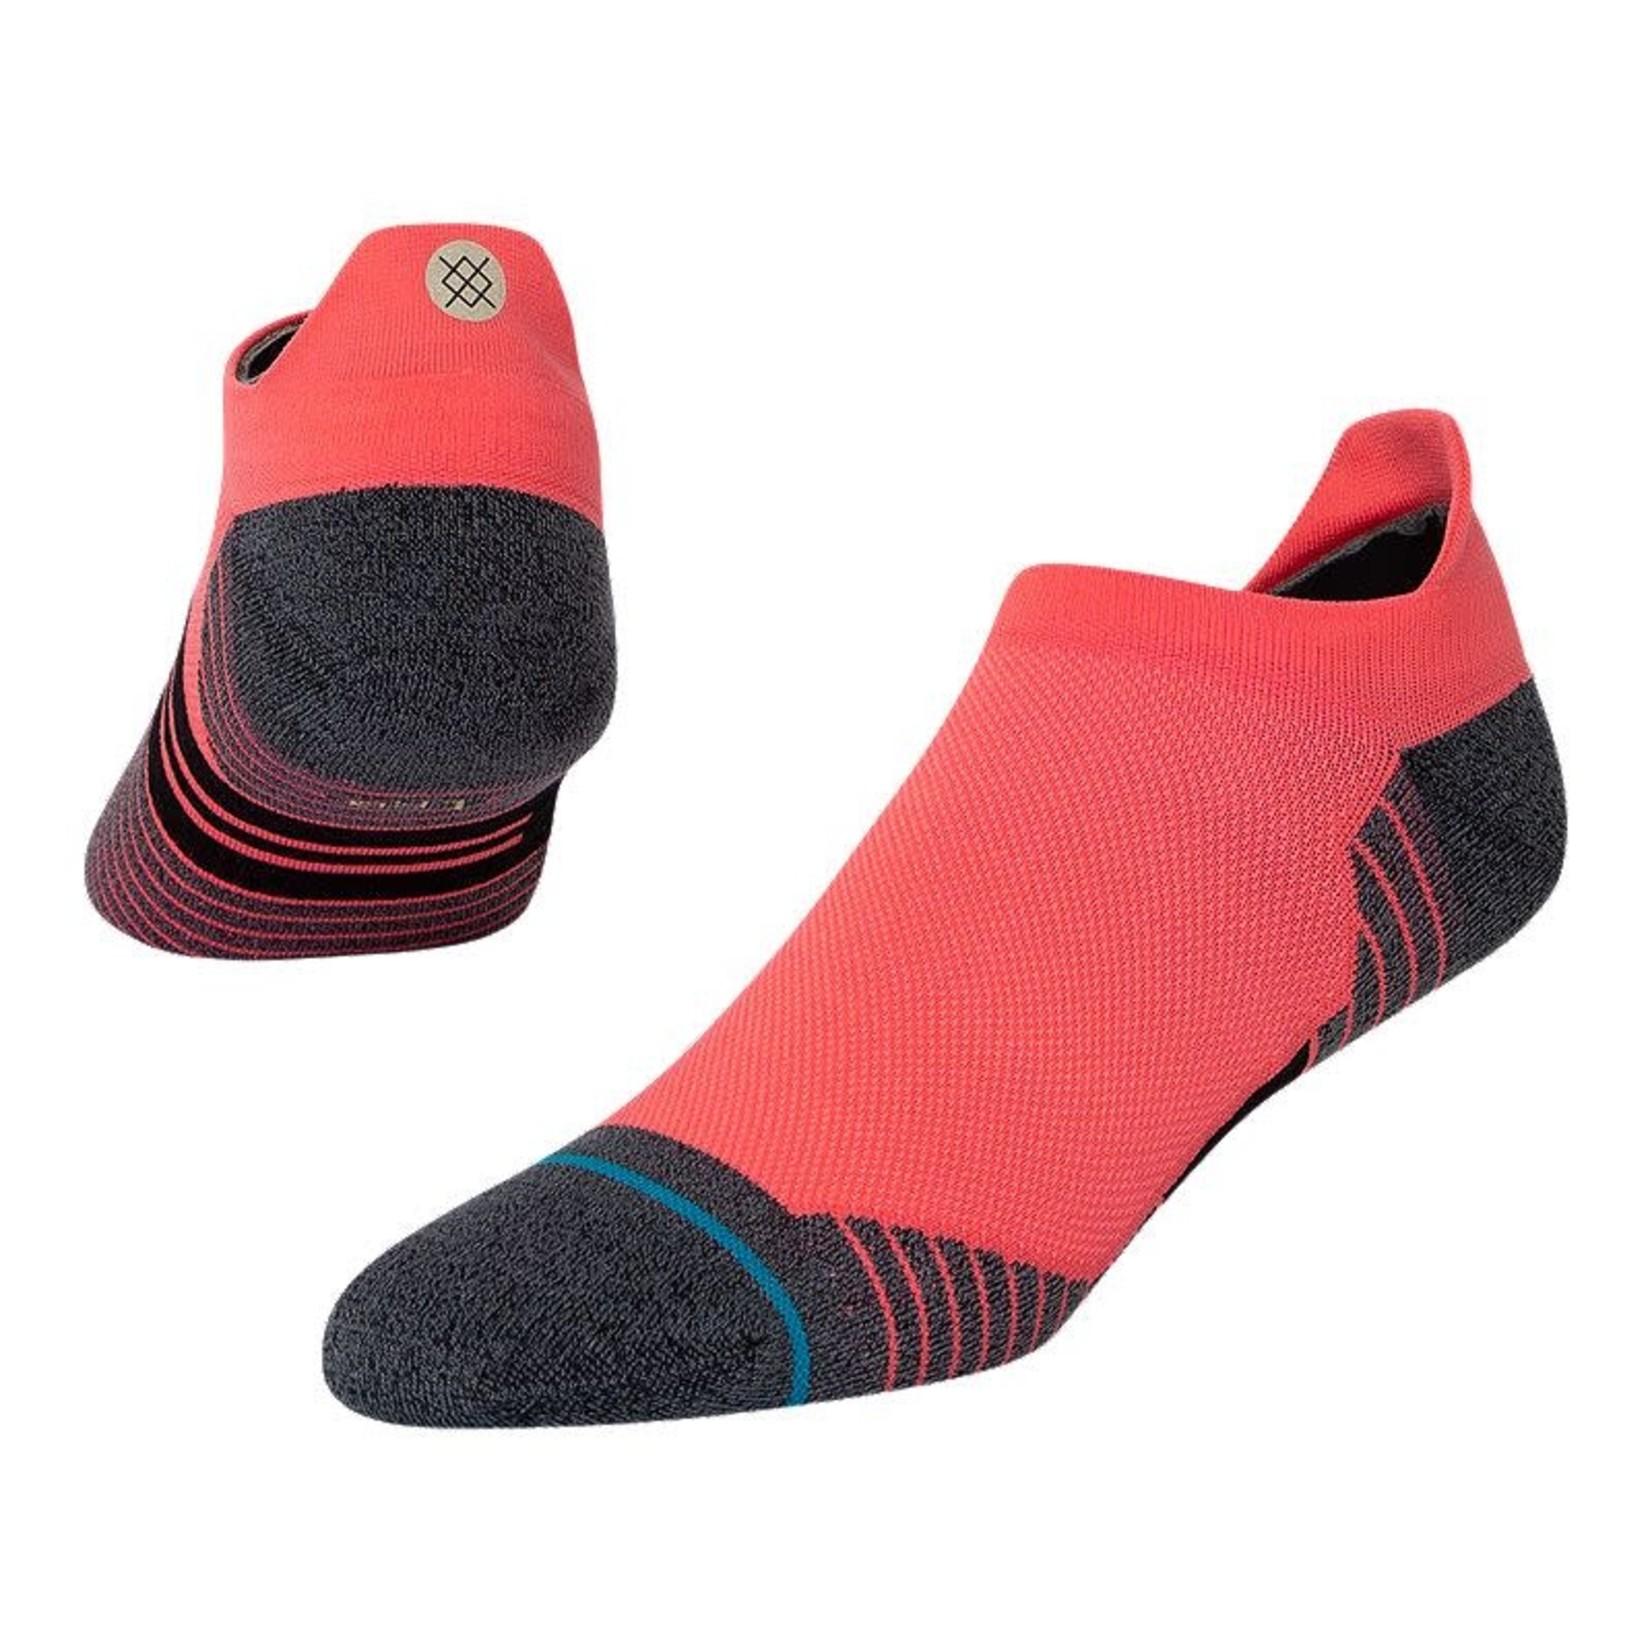 Stance Stance Socks, Ultra Tab